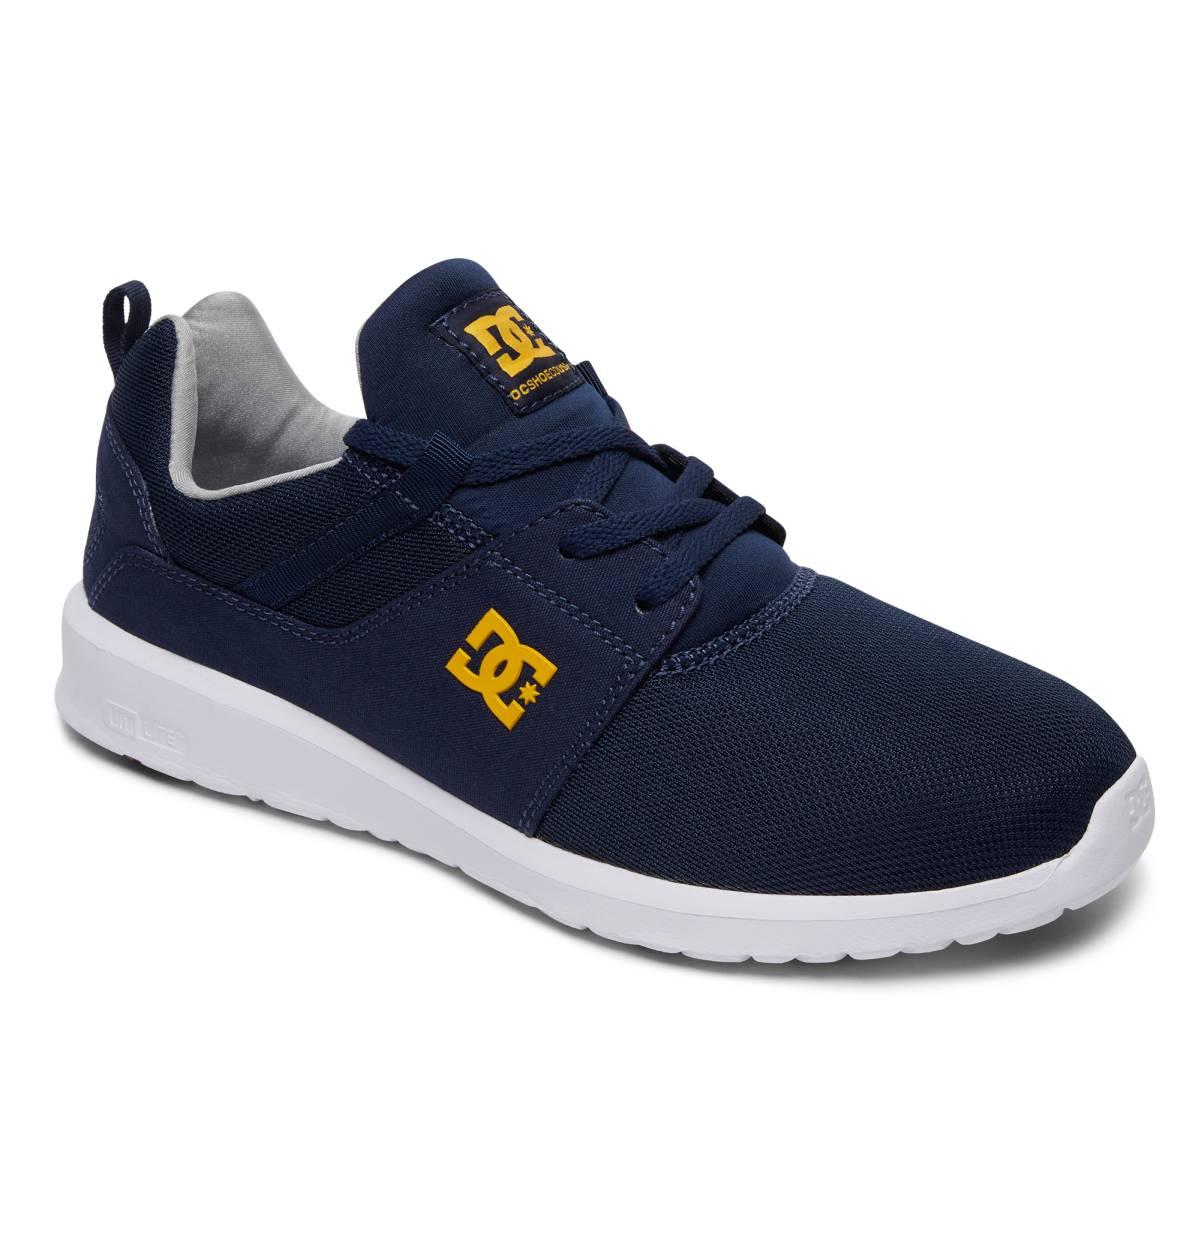 DC SHOES Heathrow Low-Cut Sneaker Herren Schuhe Skateschuhe blau Navy Gold